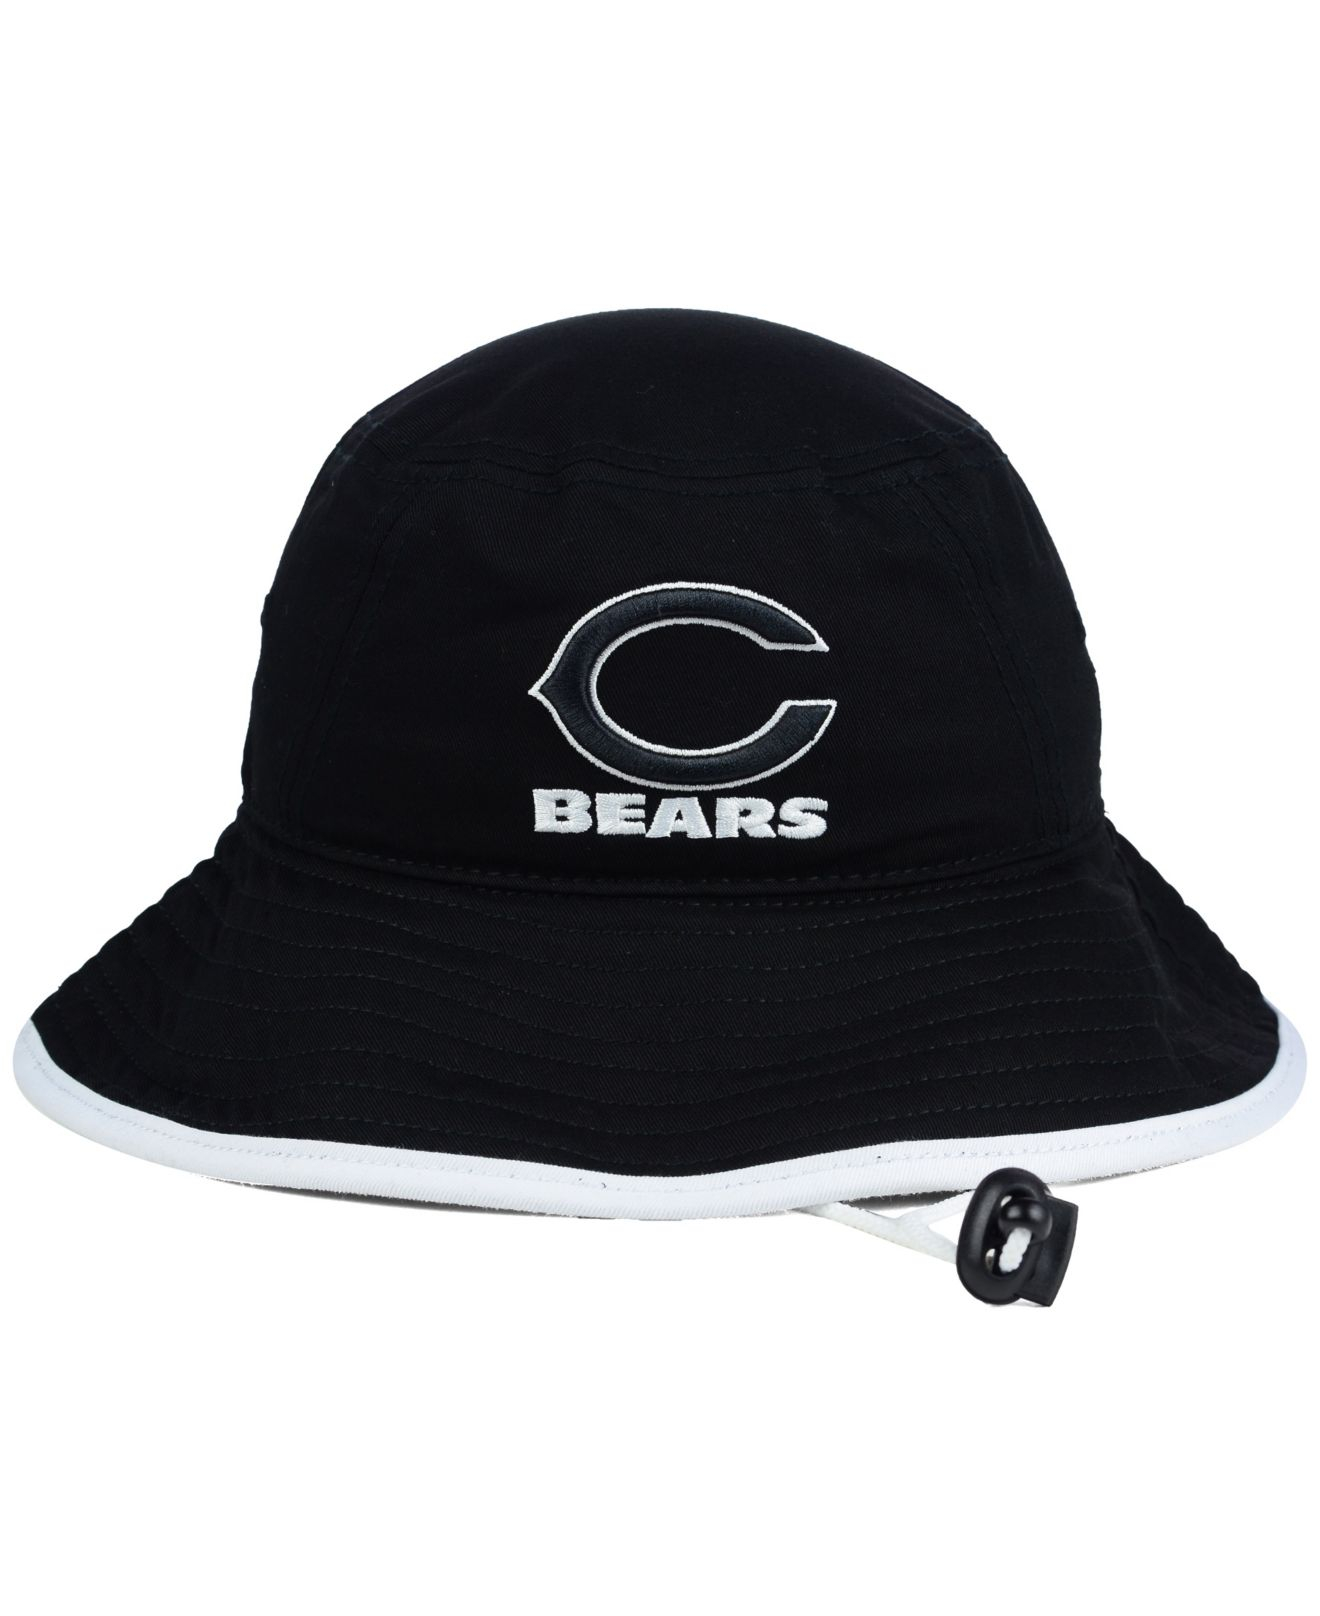 Discount KTZ Chicago Bears Nfl Black White Bucket Hat in Black Lyst  free shipping